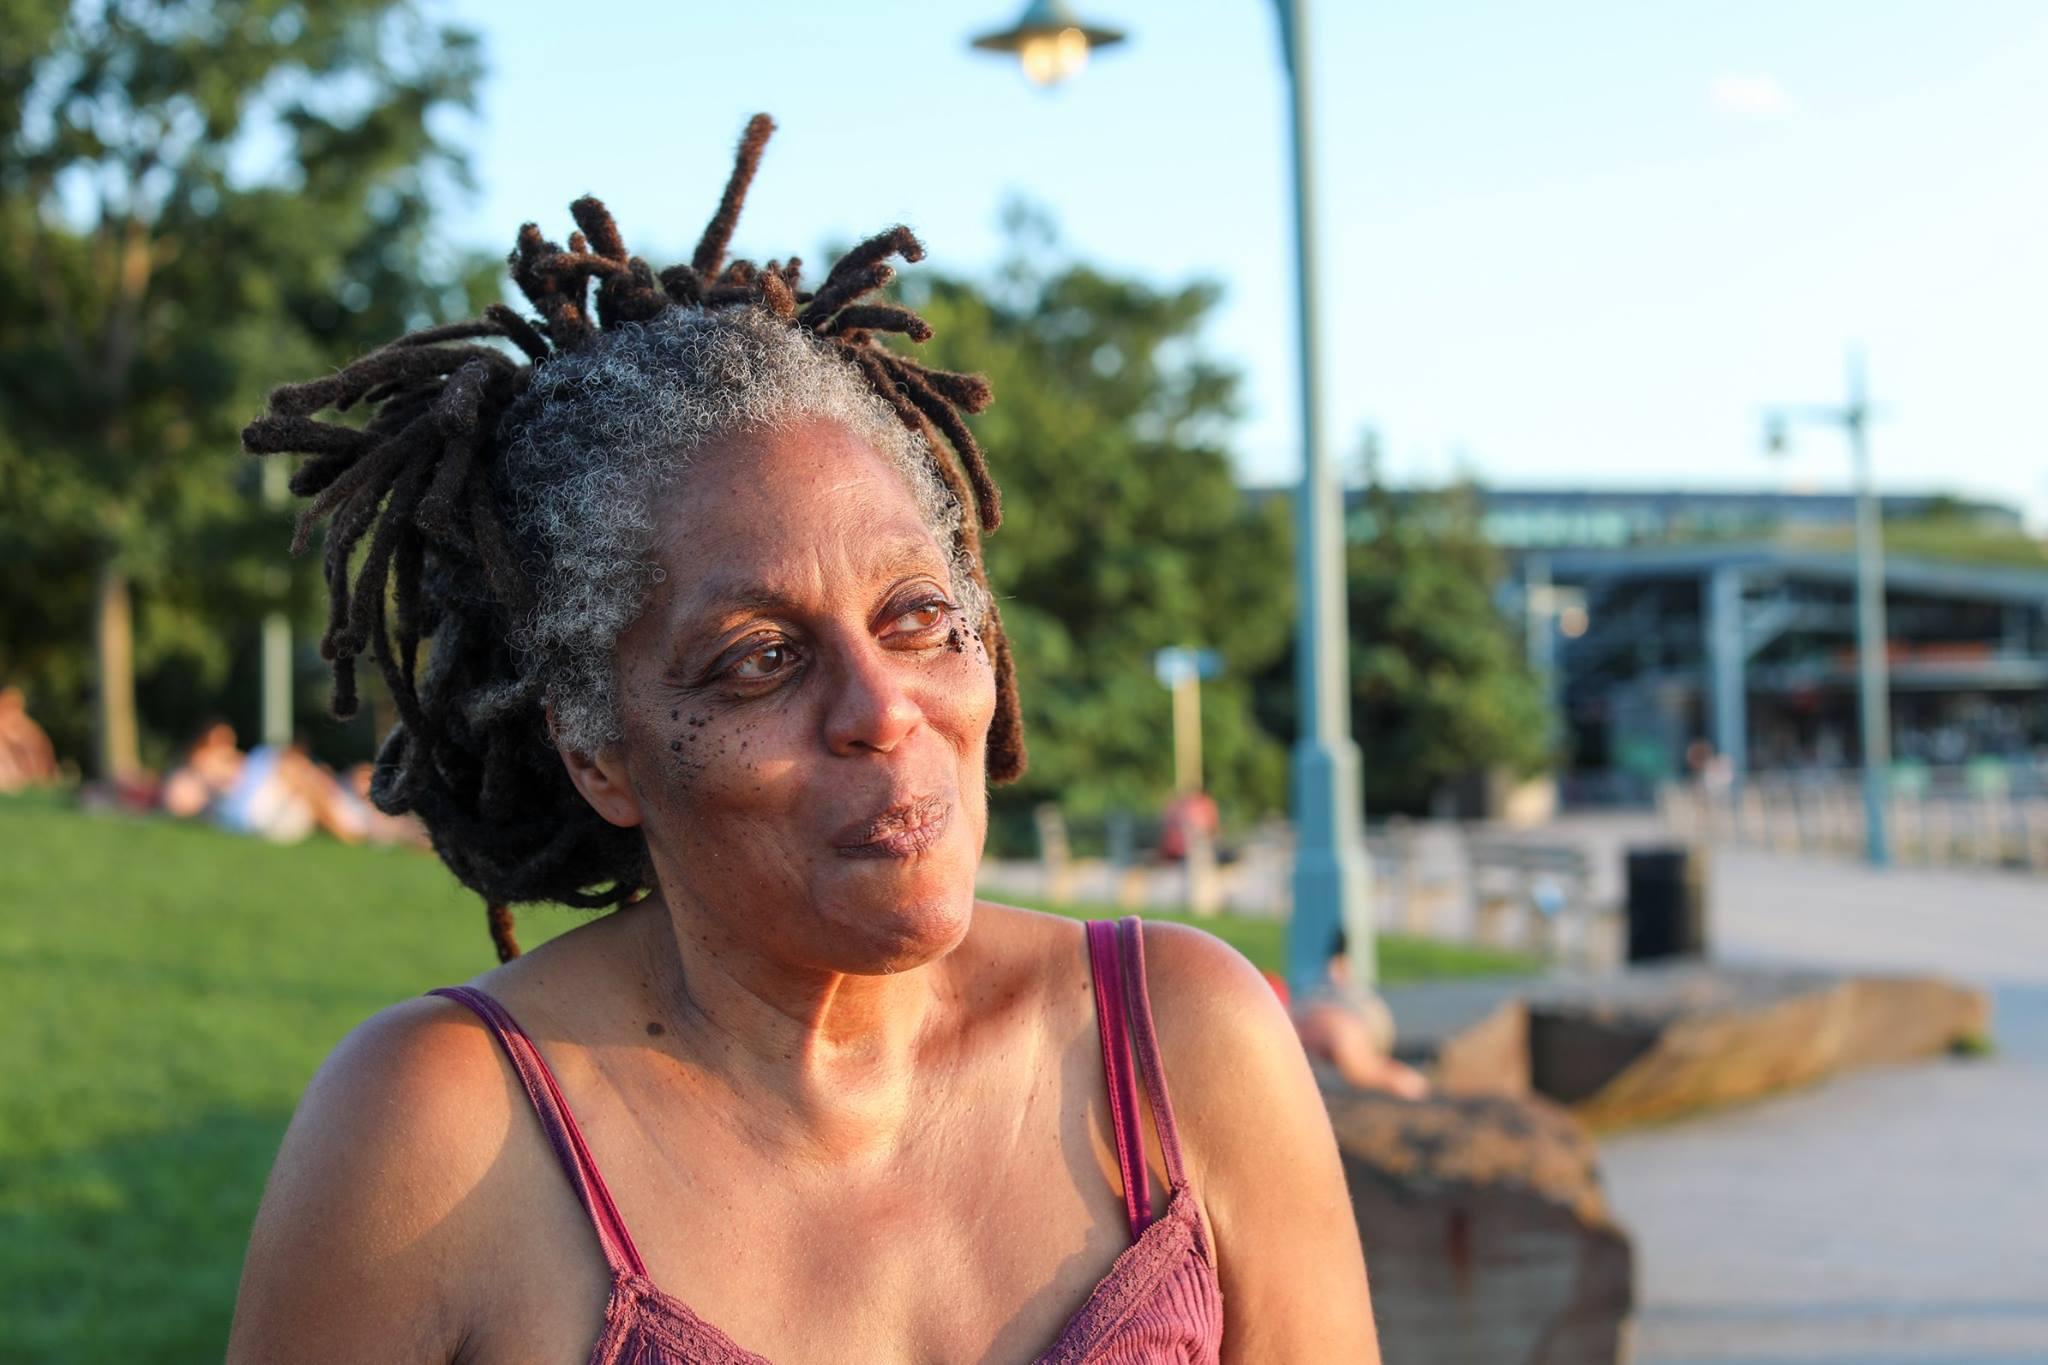 Photo credit: Humans of New York.